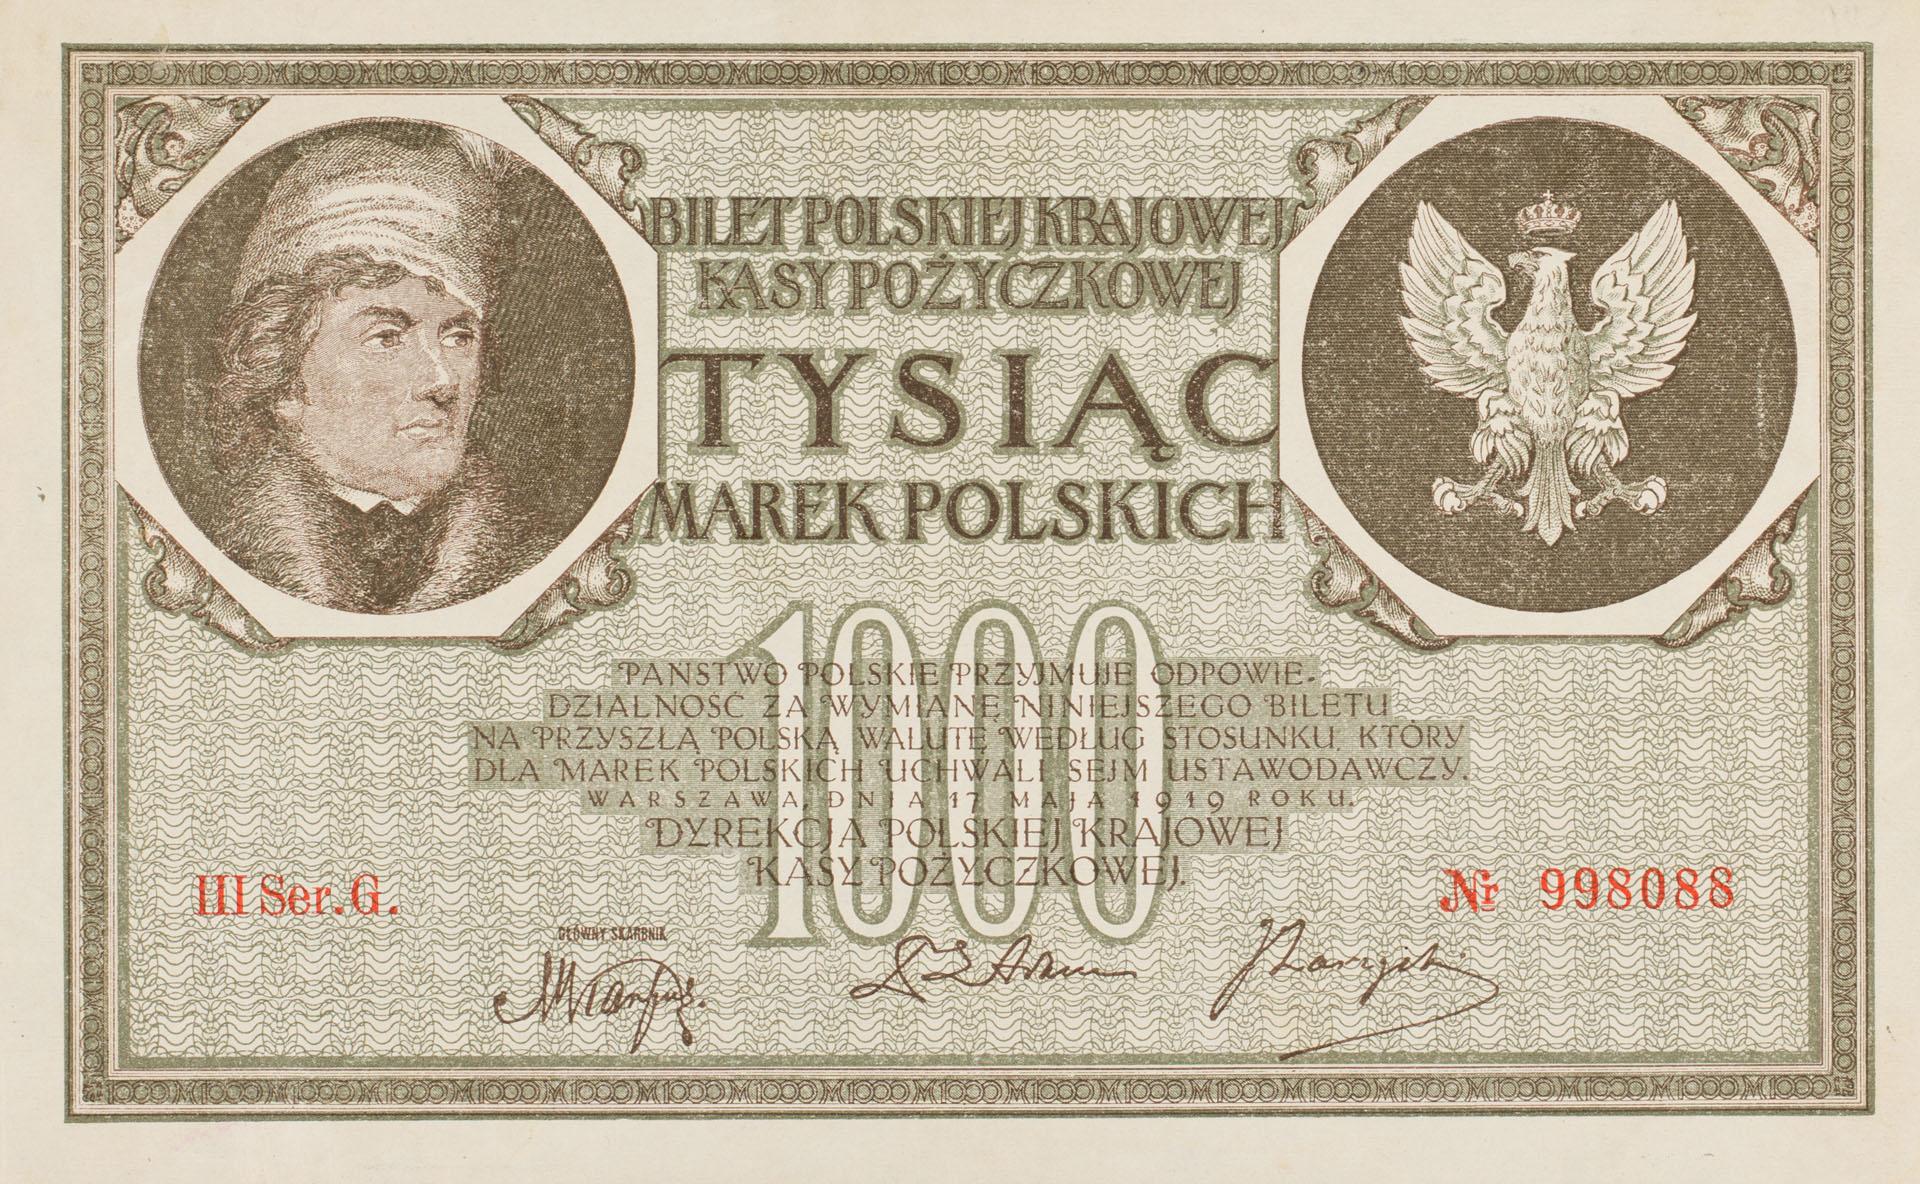 Banknot 1000 marek polskich